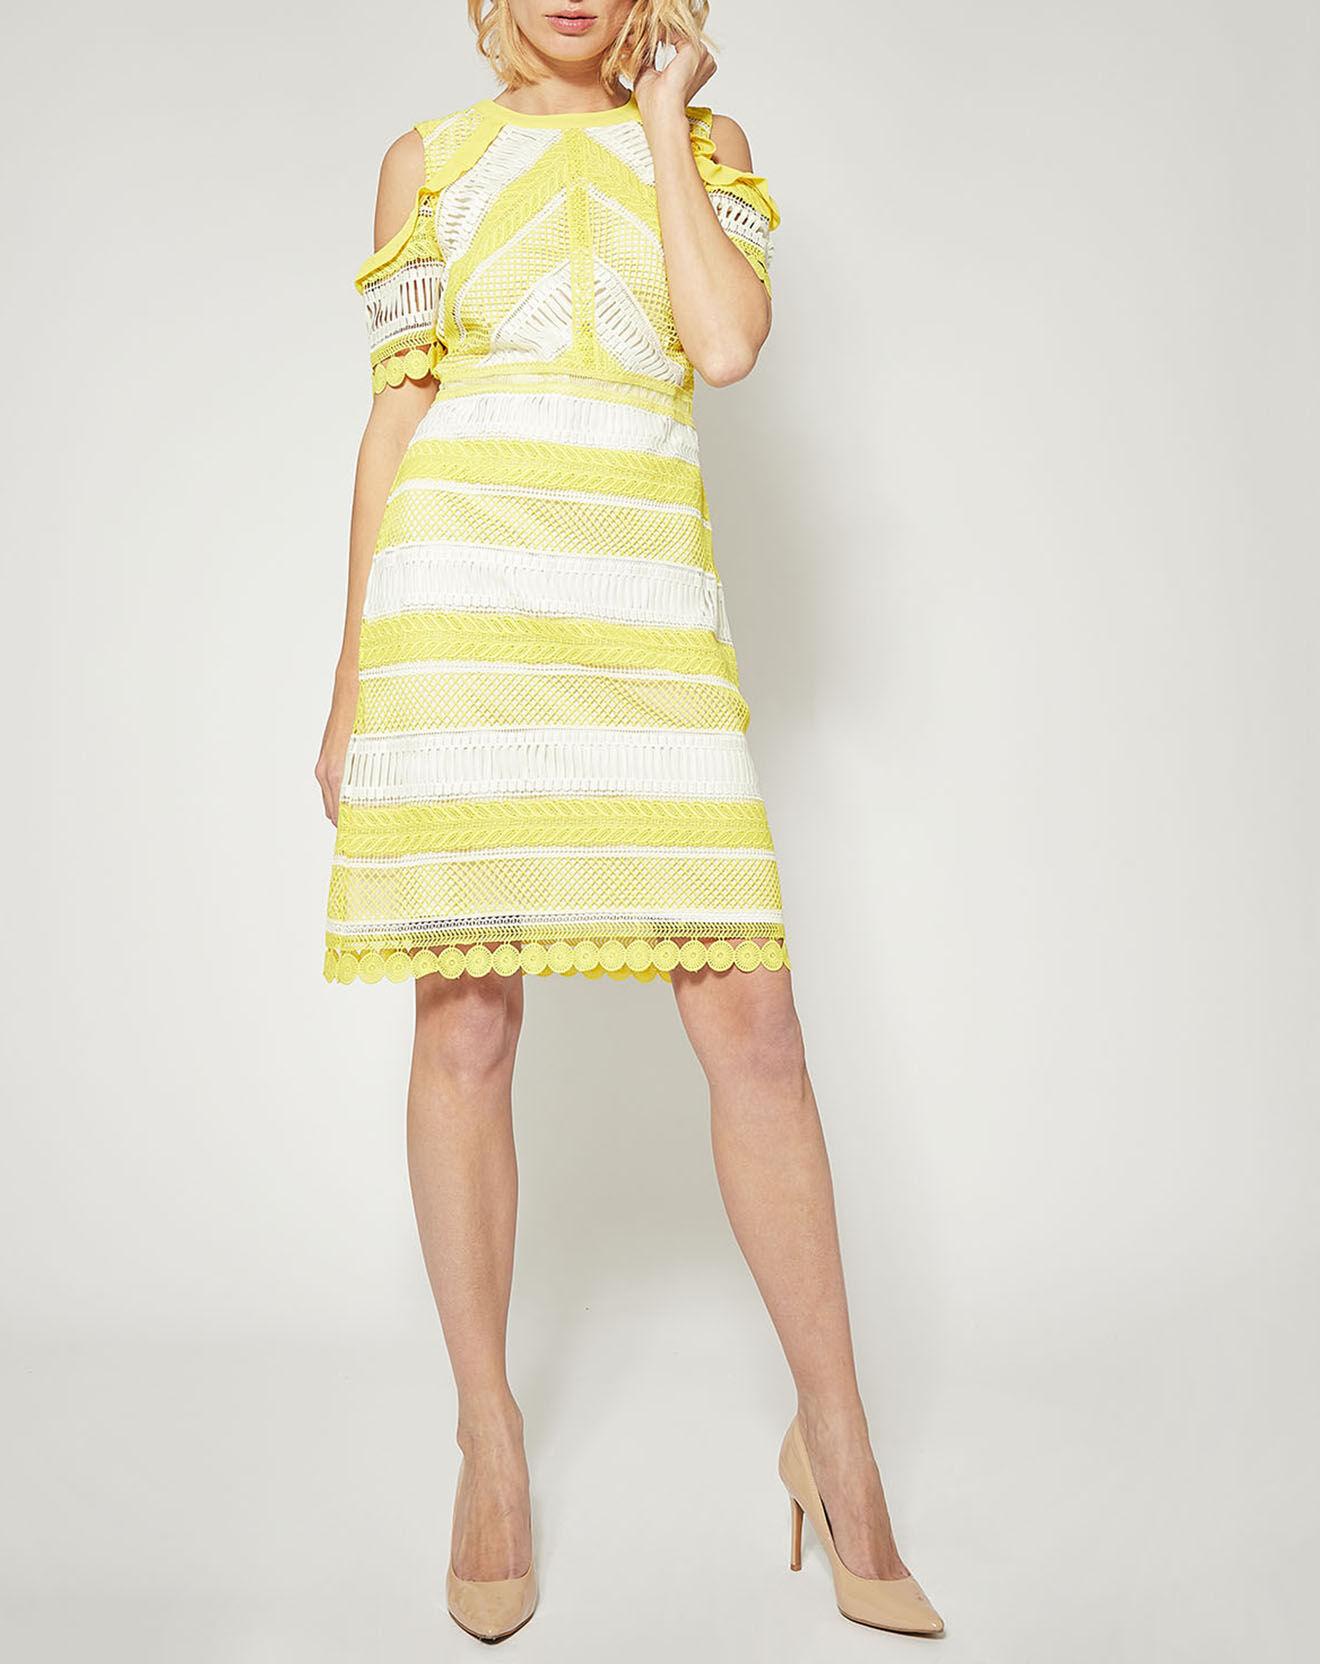 Robe Capitiene dentelle contrastante jaune safran - Derhy - Modalova